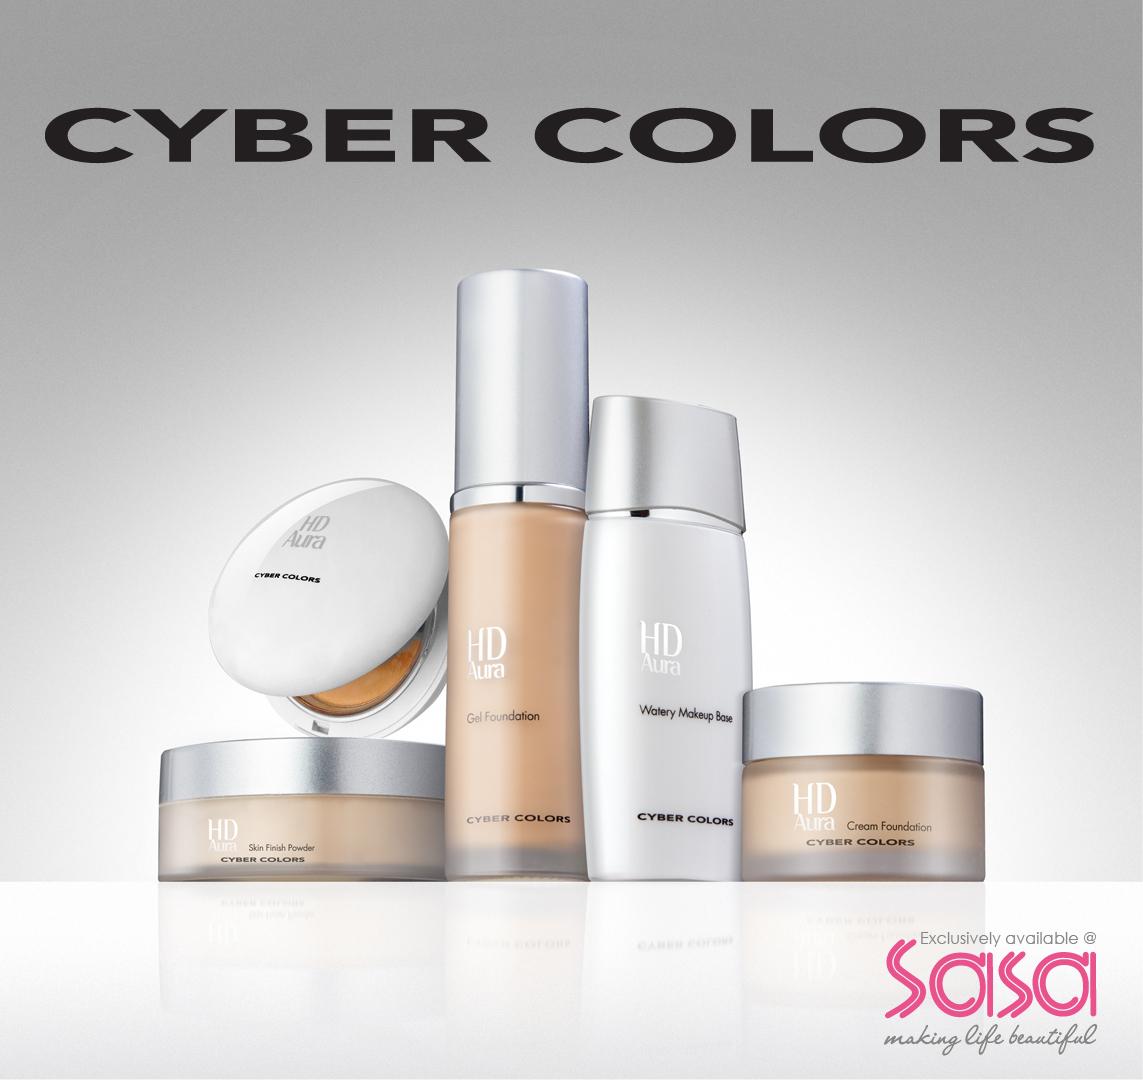 iiwen tan s blog sasa cyber color hd aura